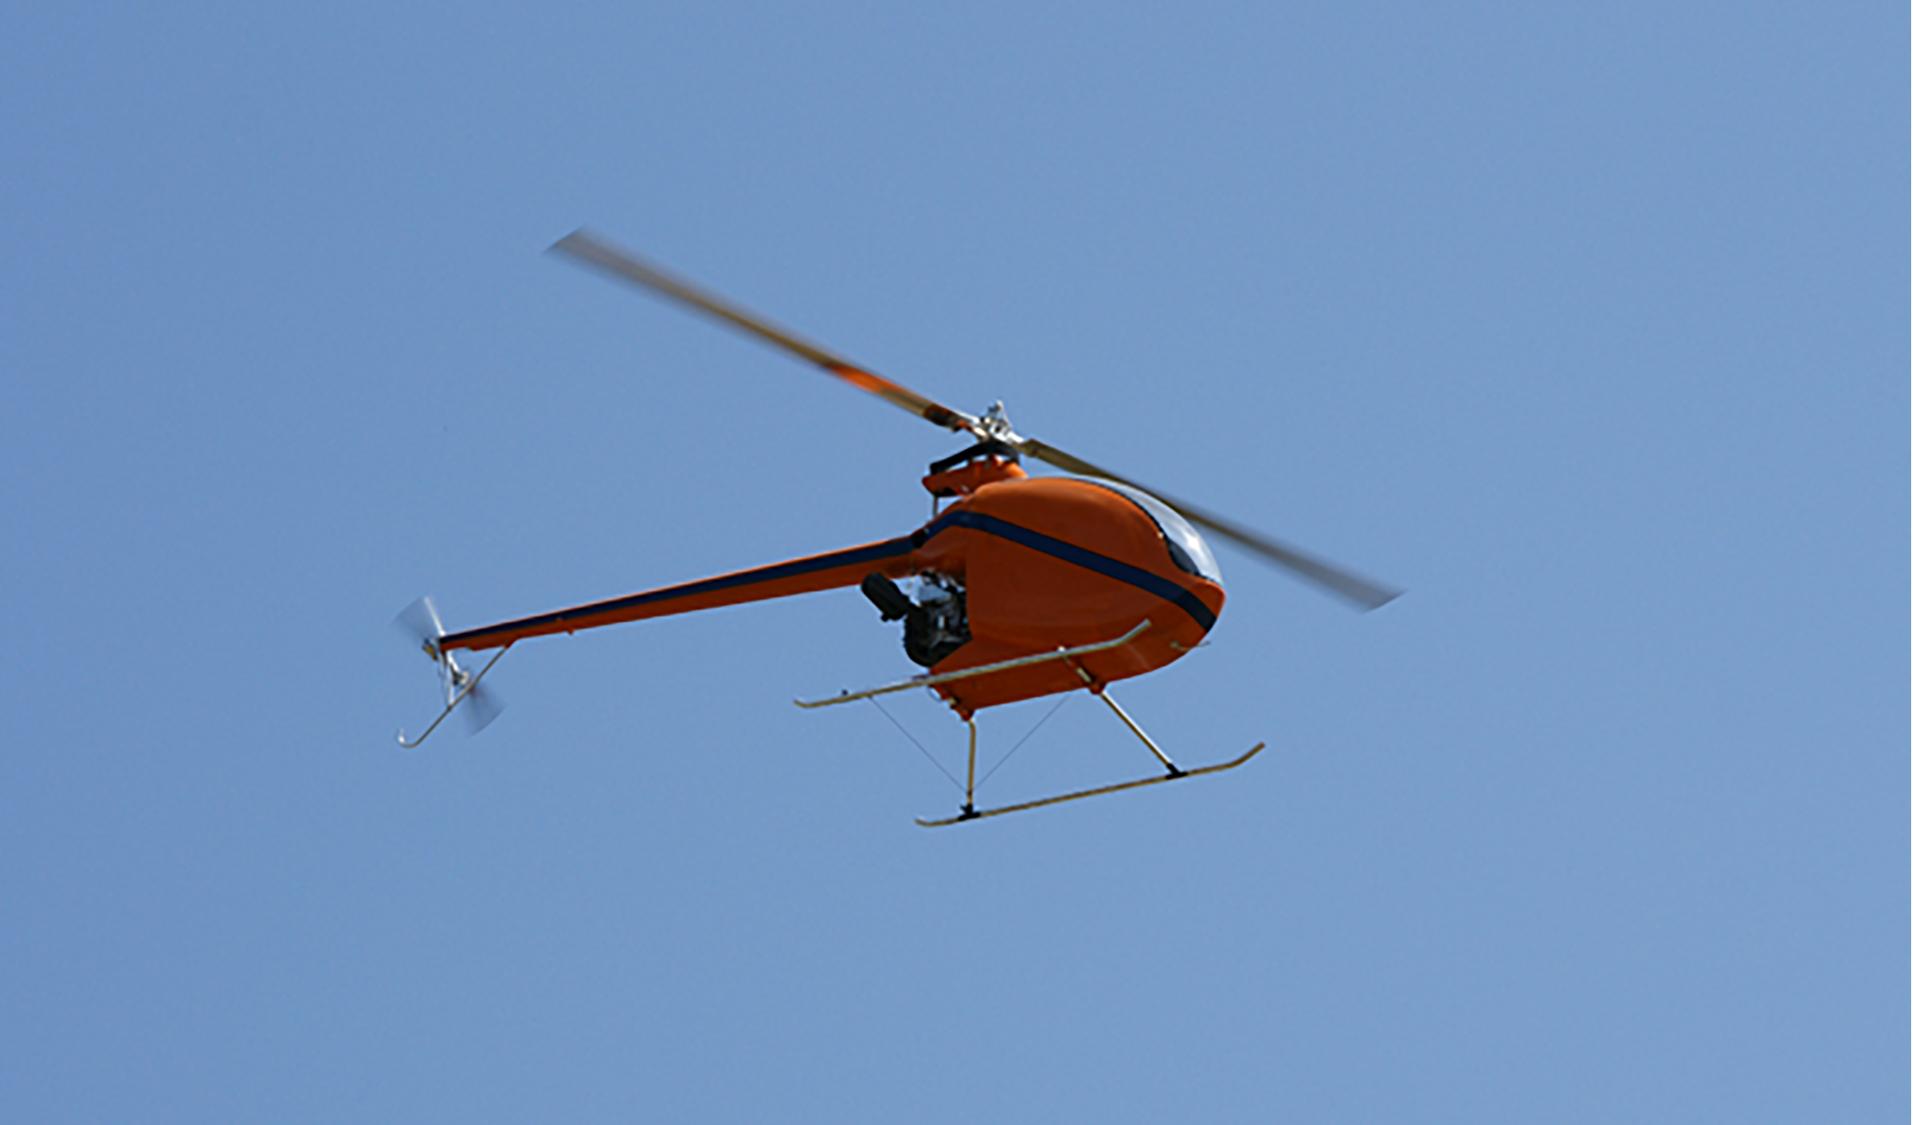 beyond line of sight, heavy payload vtol UAS drone UAV